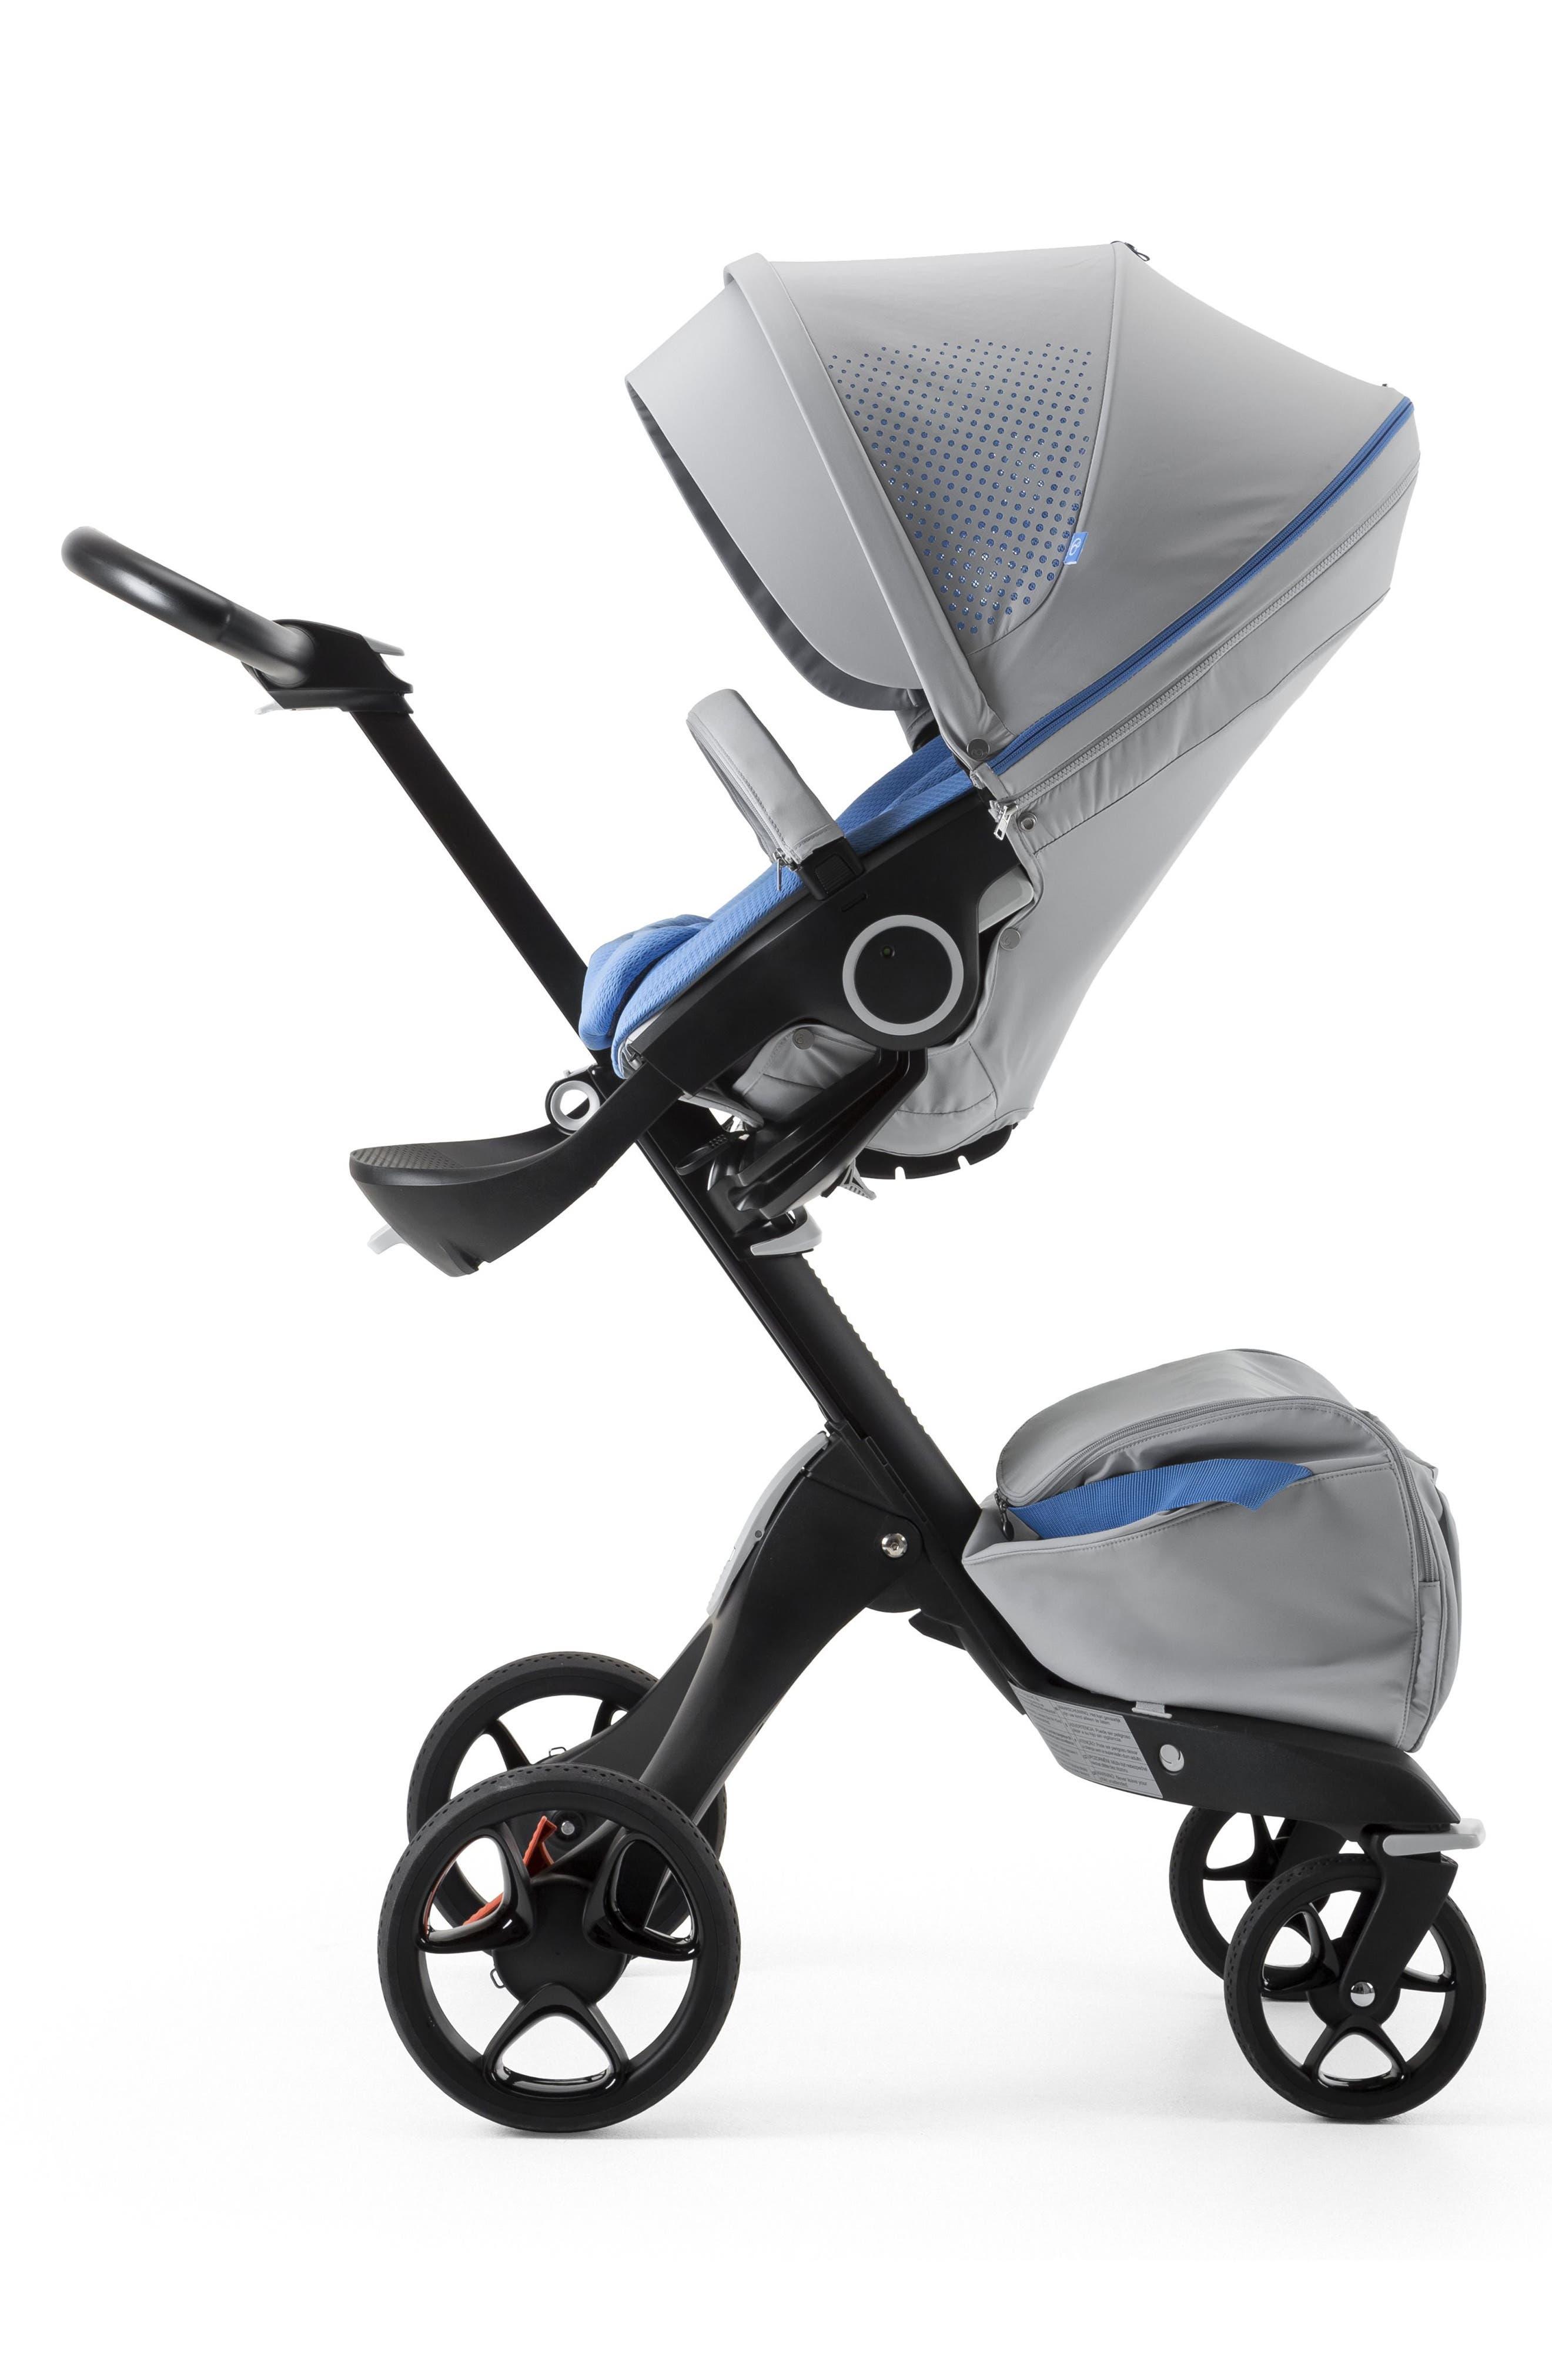 Main Image - Stokke Xplory® V5 Athleisure Stroller